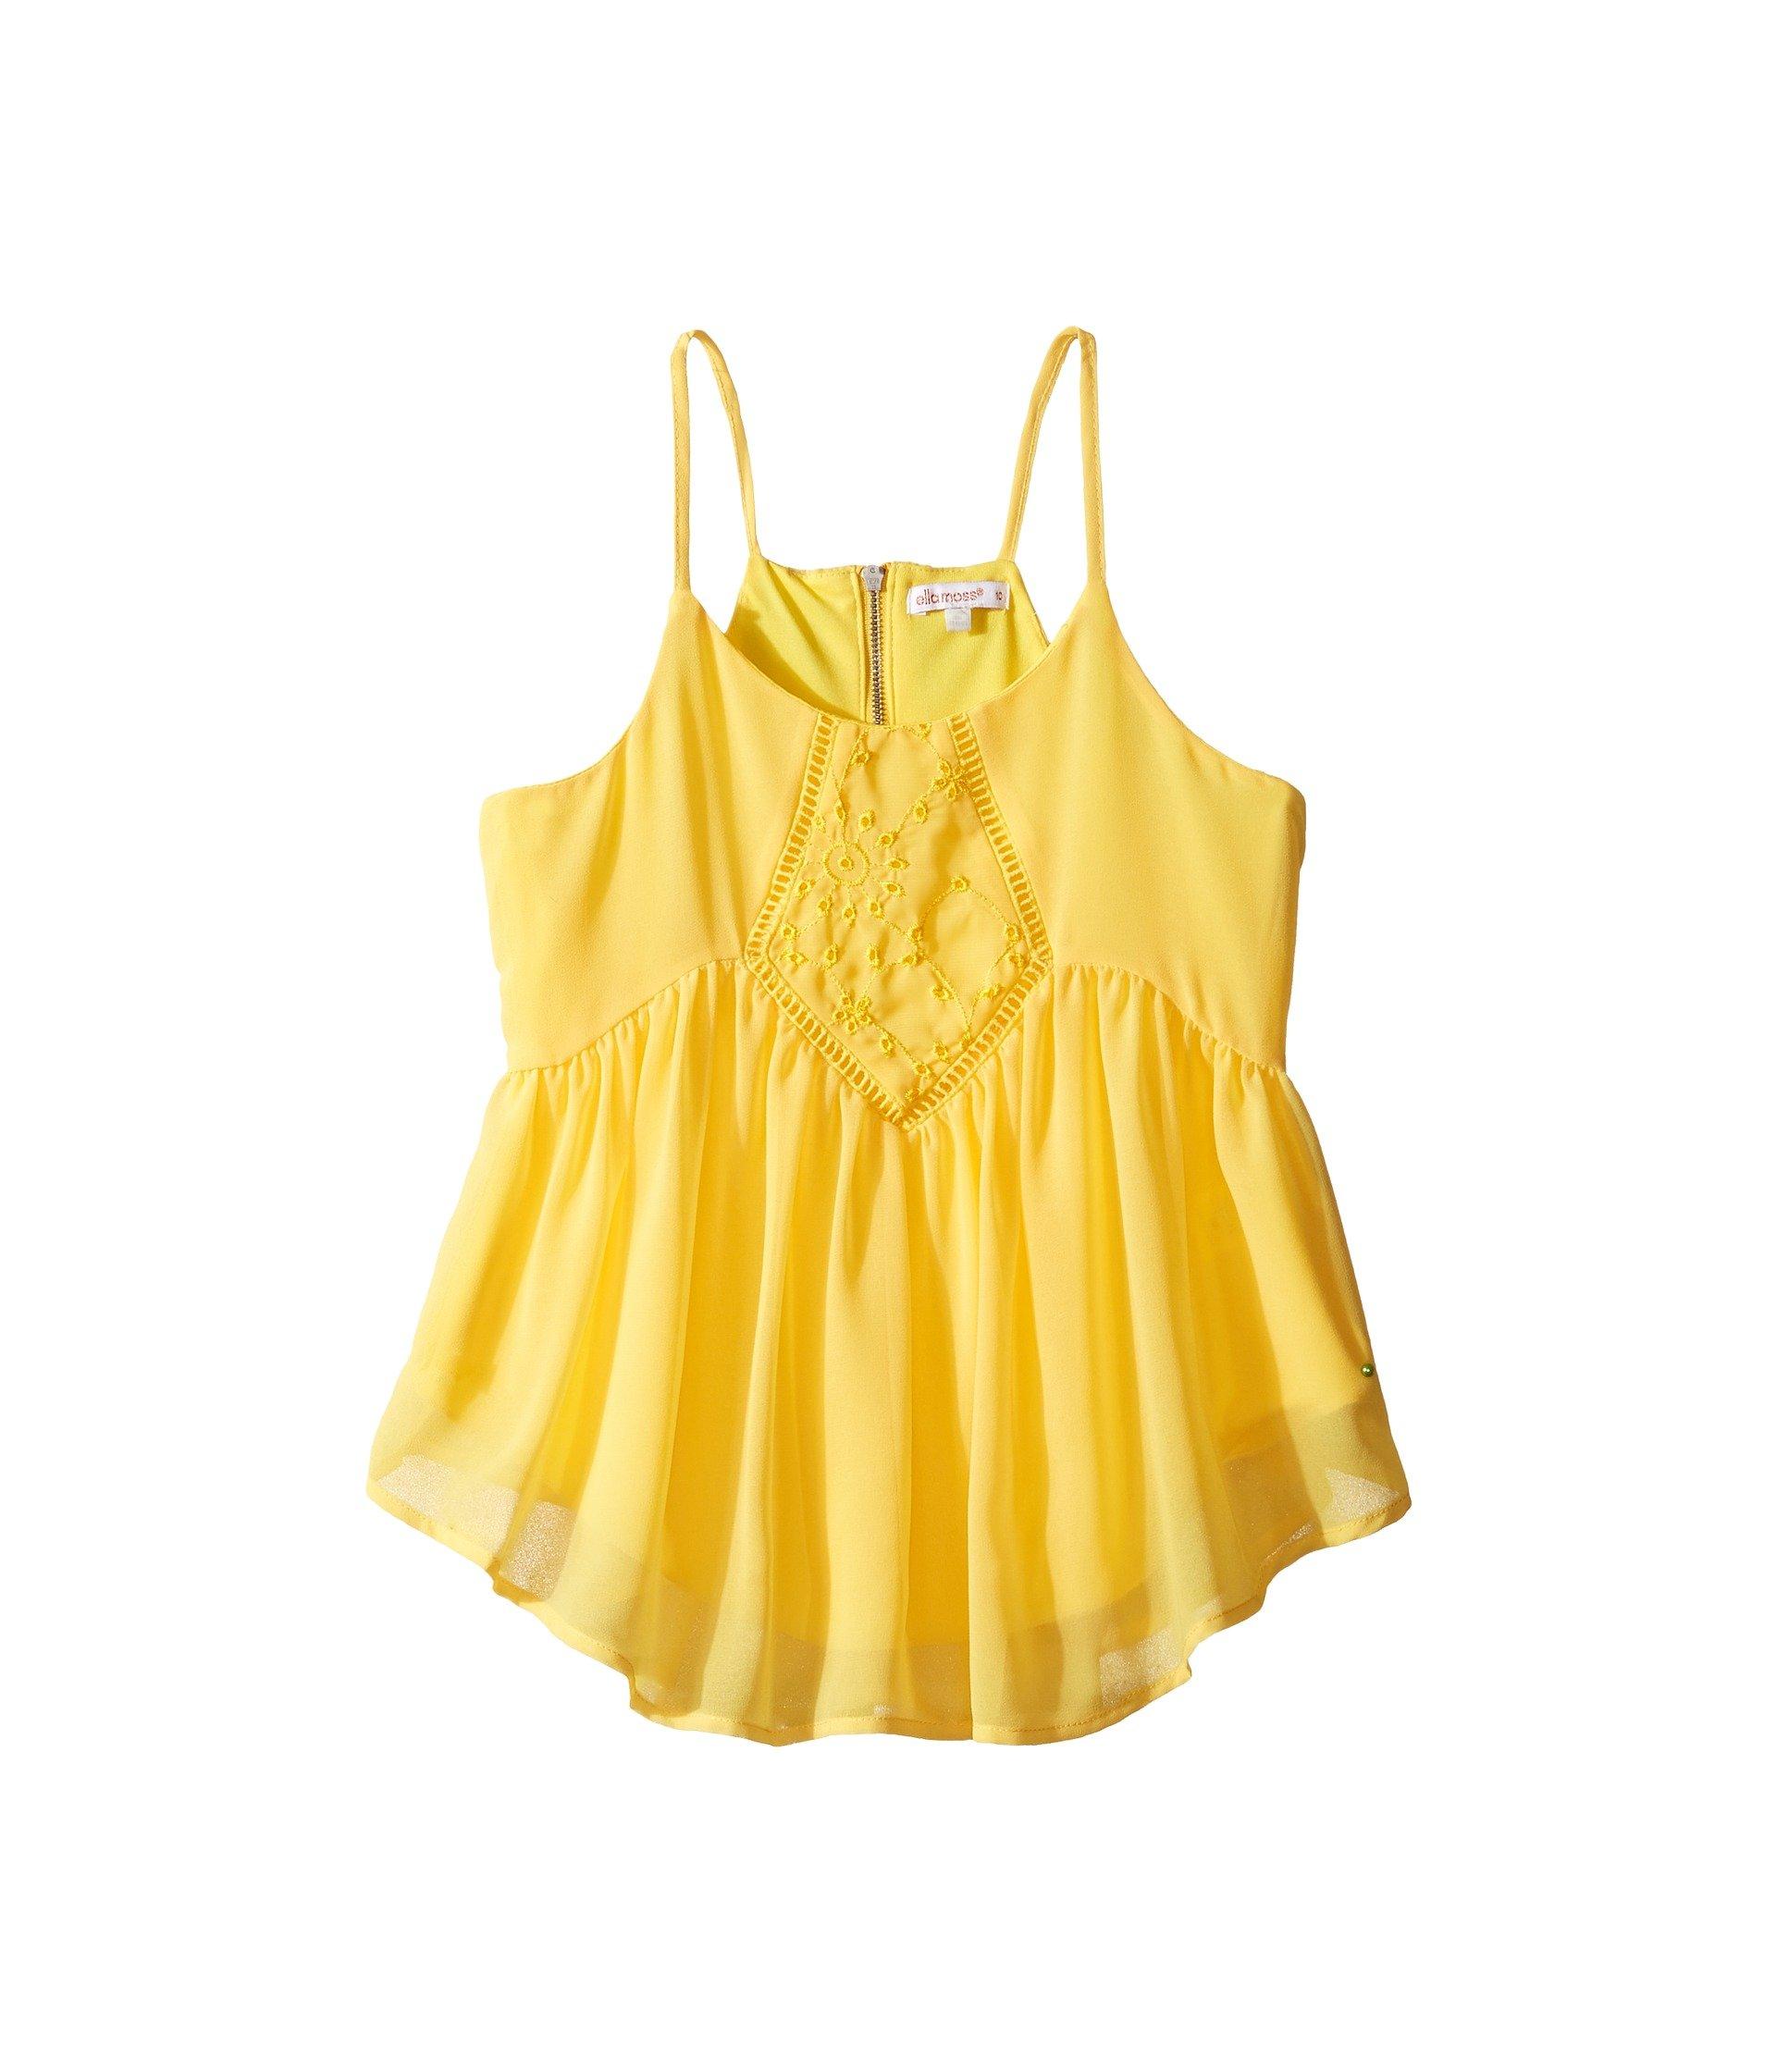 Blusa para Niña Ella Moss Girl Daniella Baby Doll Top (Big Kids)  + Ella Moss en VeoyCompro.net